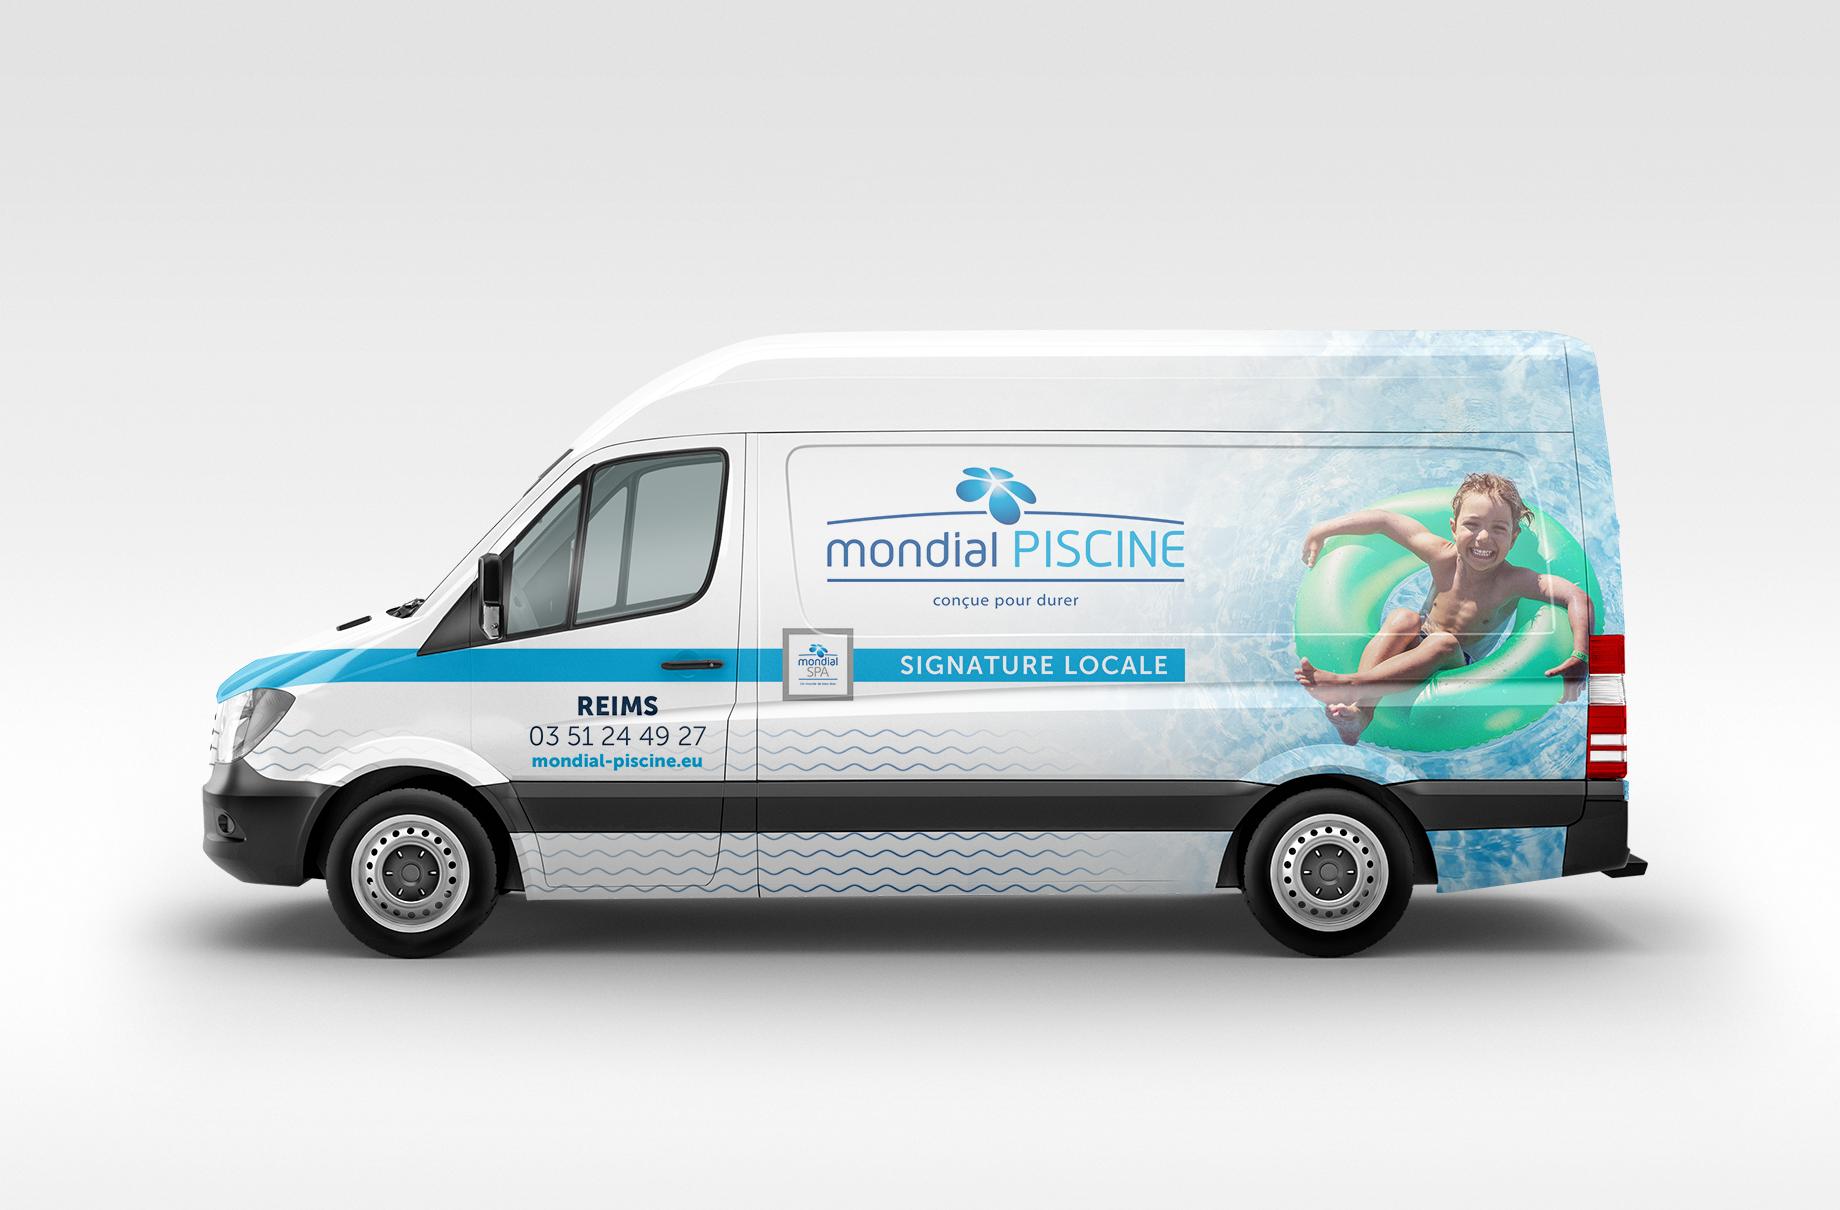 mondial-piscine-habillage-camionnette-profil